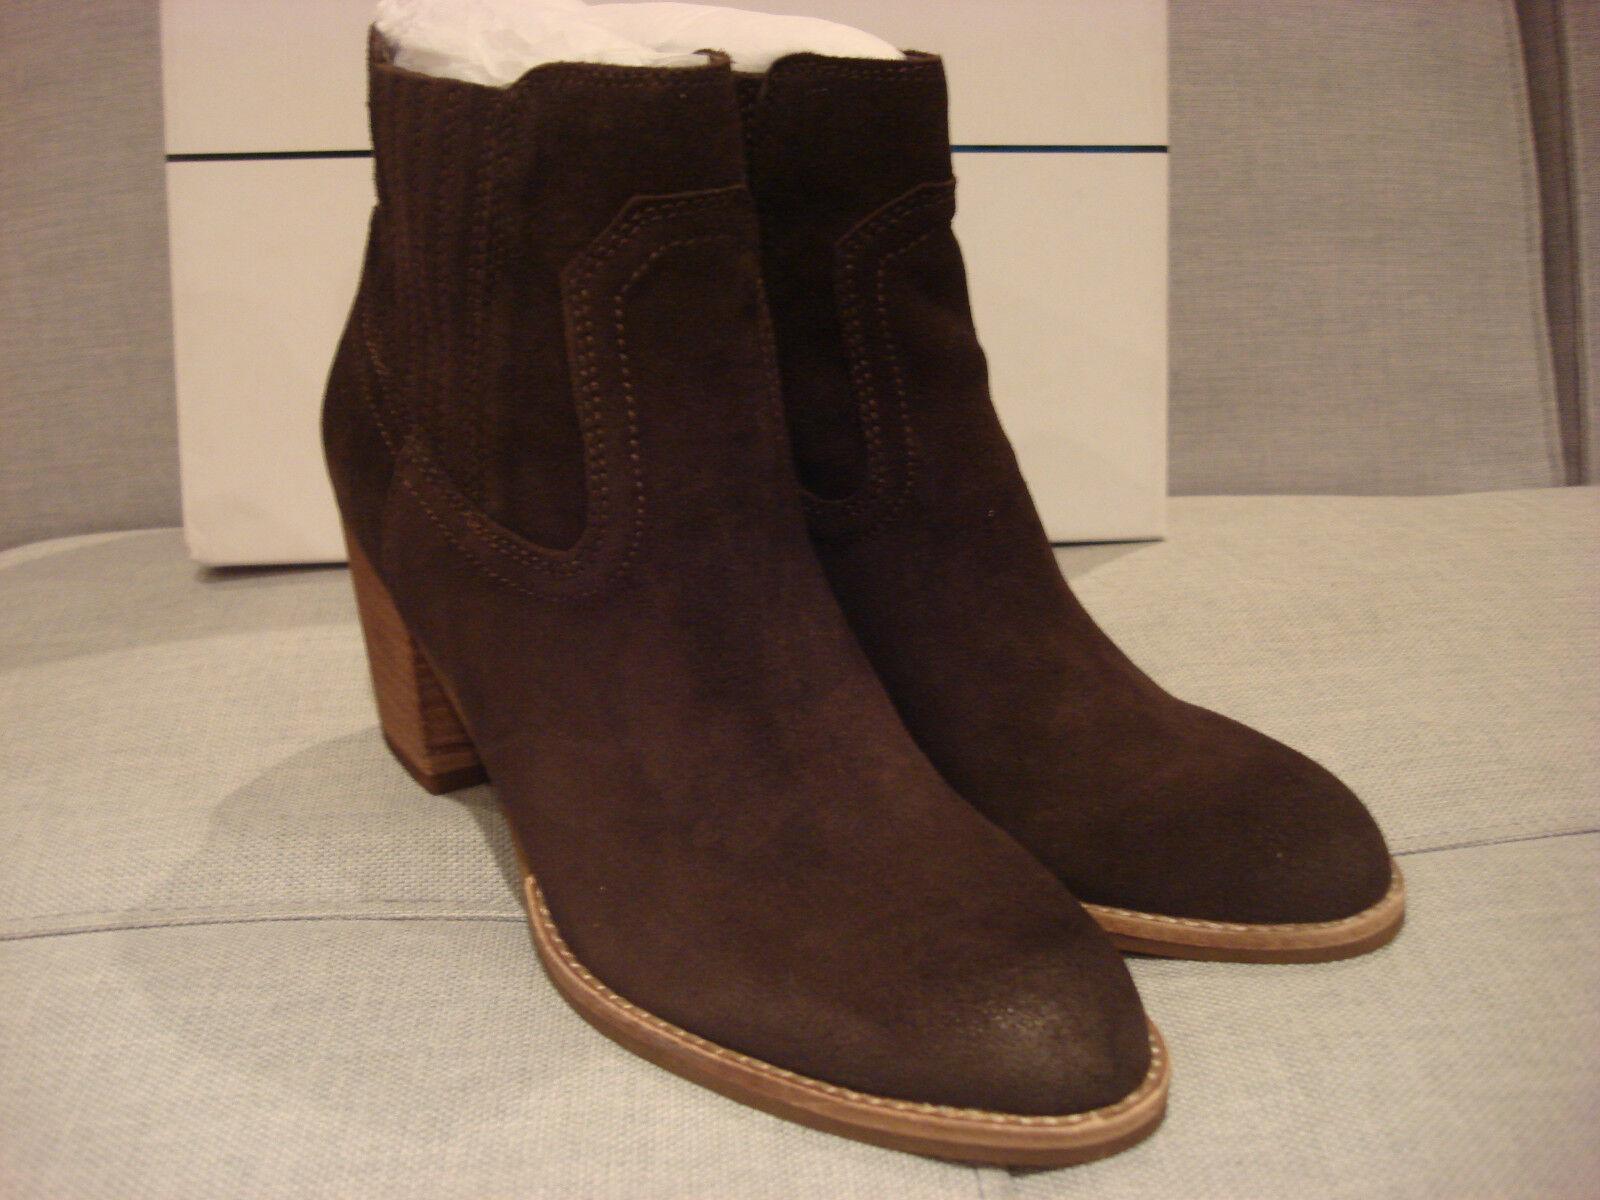 DOLCE VITA WOMEN'S JARI ANKLE ESPRESSO SUEDE SIZE 8 Schuhe - BRAND NEW